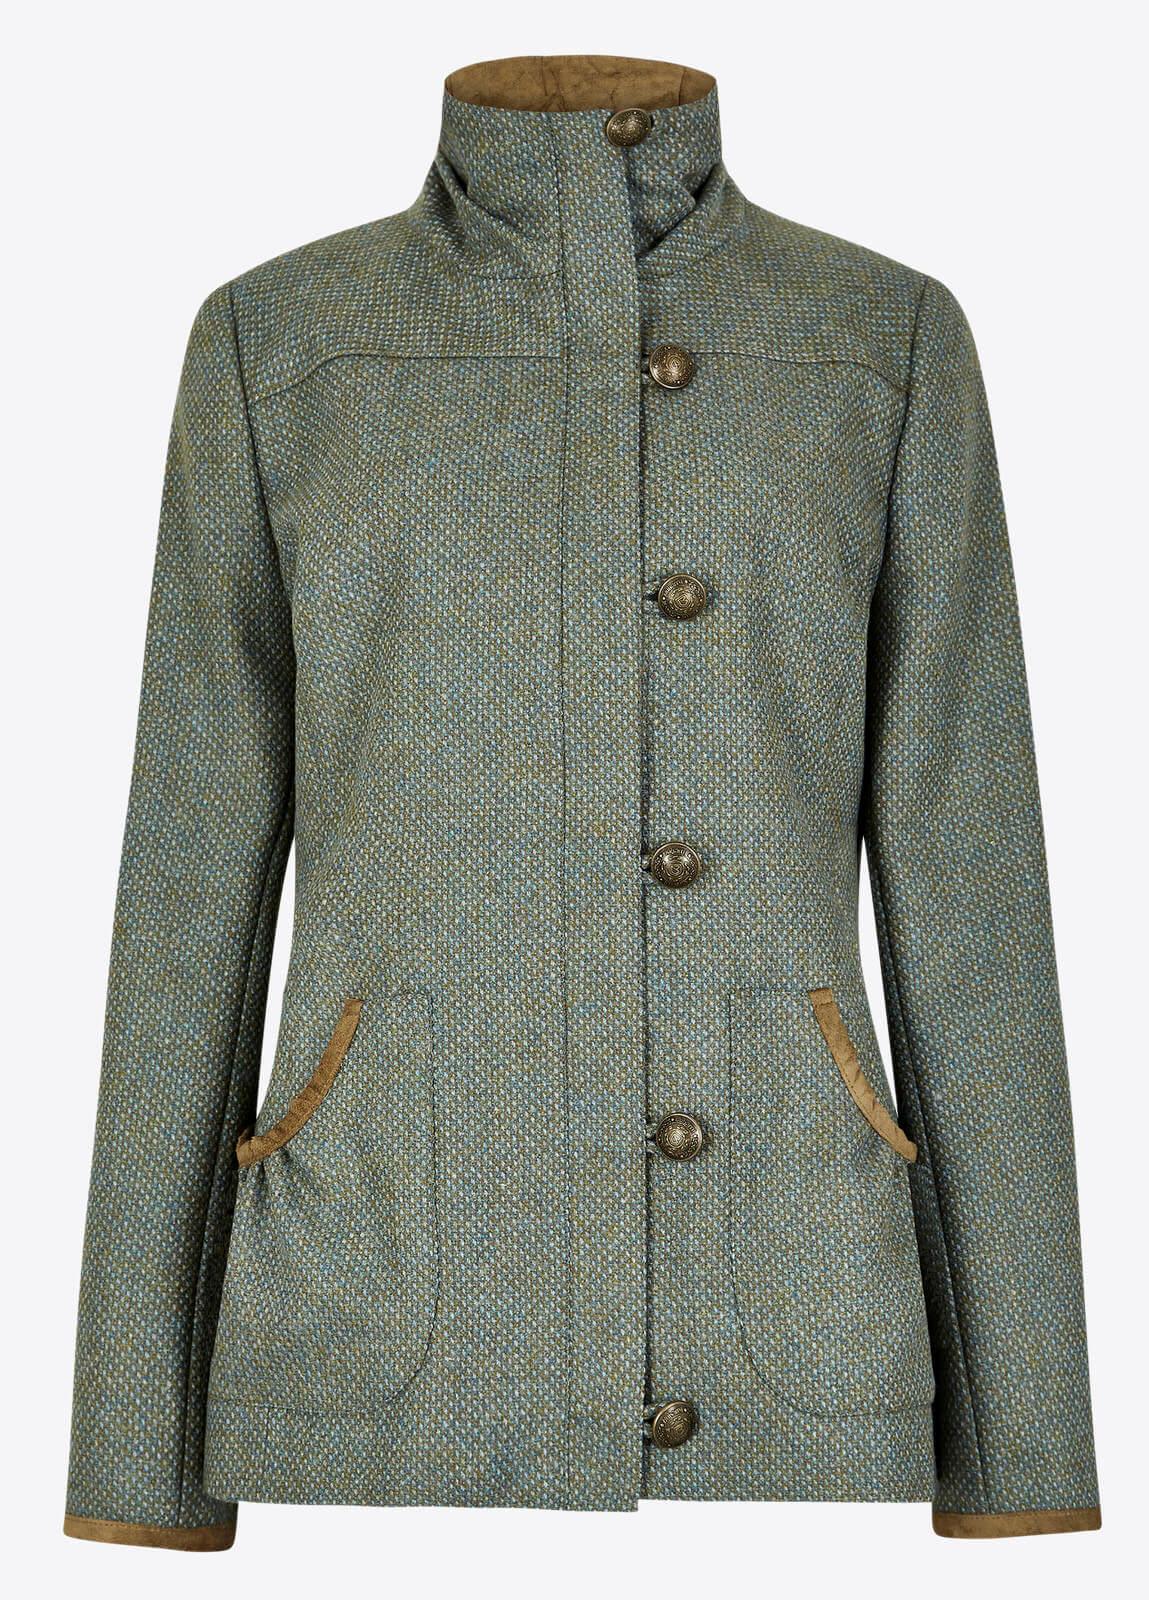 Bracken Tweed Coat - Rowan